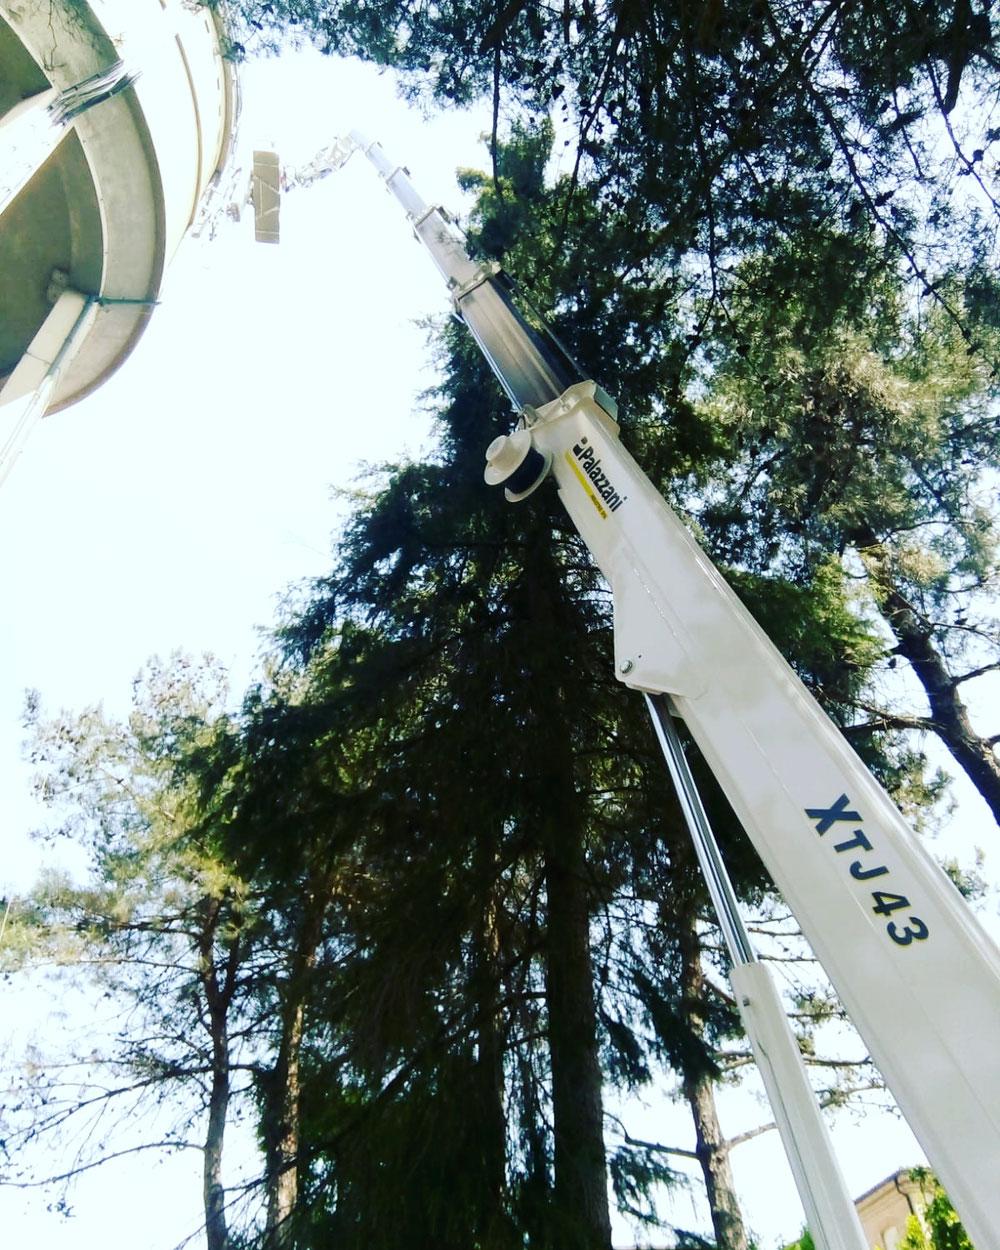 Riminigru noleggio piattaforma aerea ragno cingolata a Cervia Ravenna